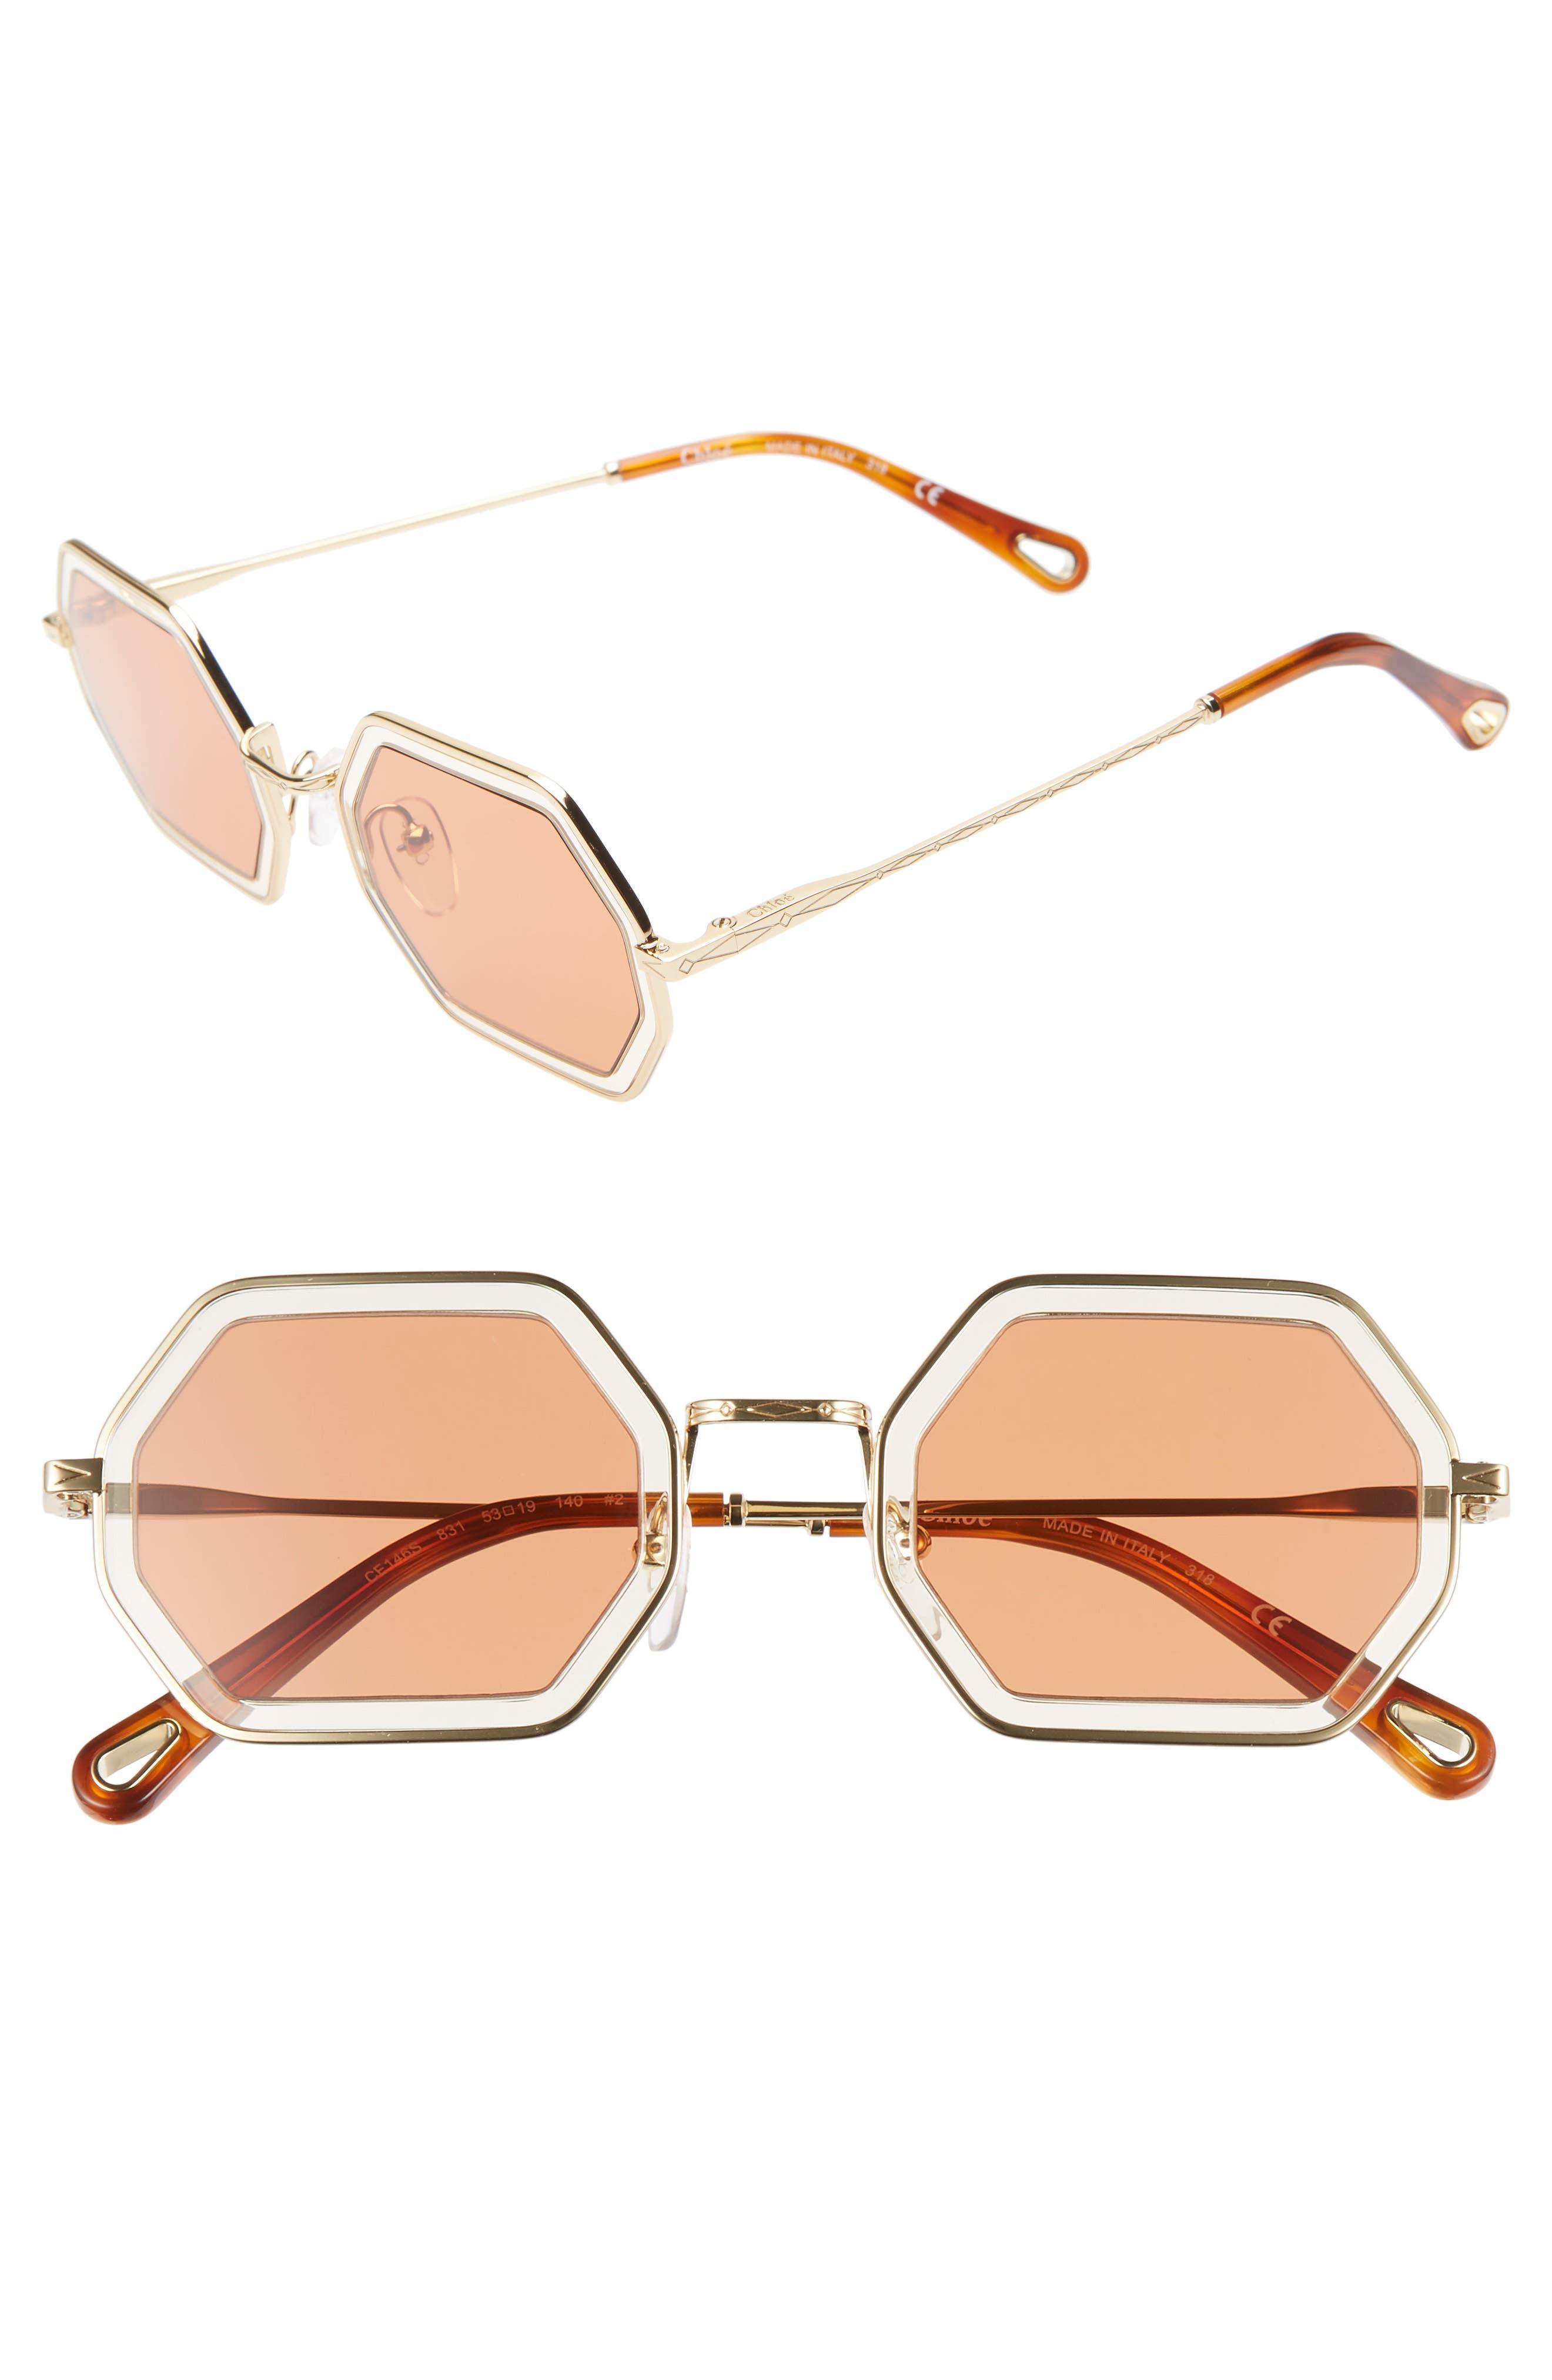 Chloe Tally 5m Octagon Sunglasses -